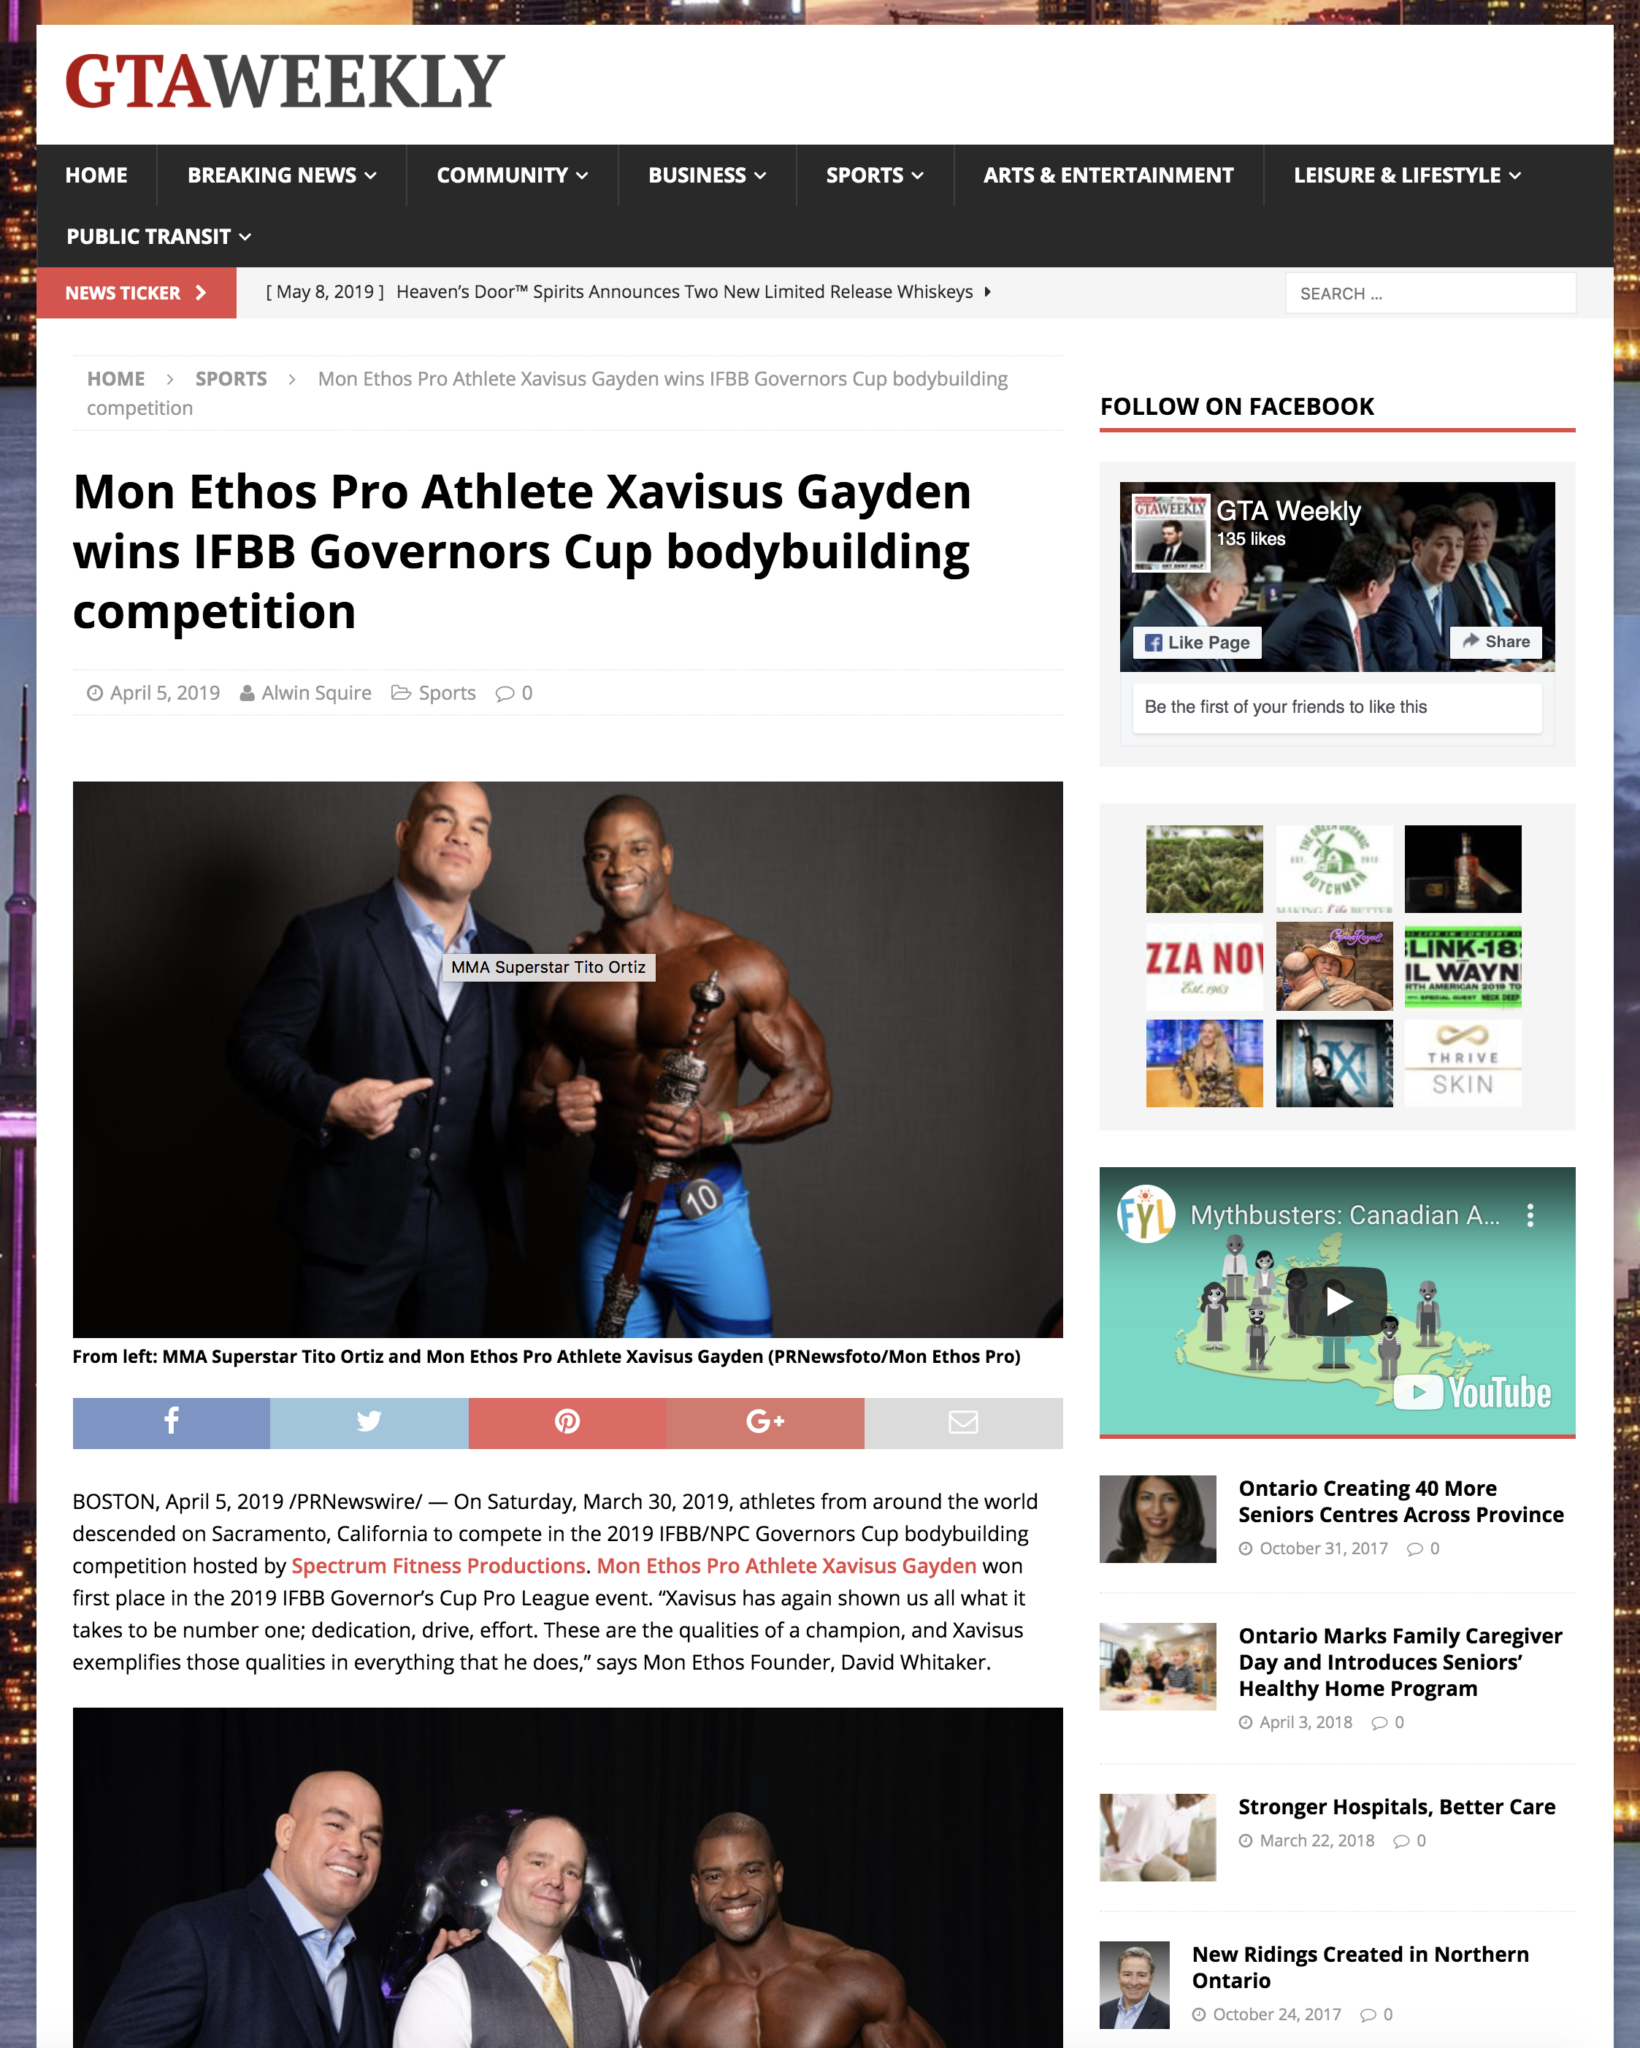 MMA Superstar Tito Ortiz and Mon Ethos Pro Athlete Xavisus Gayden